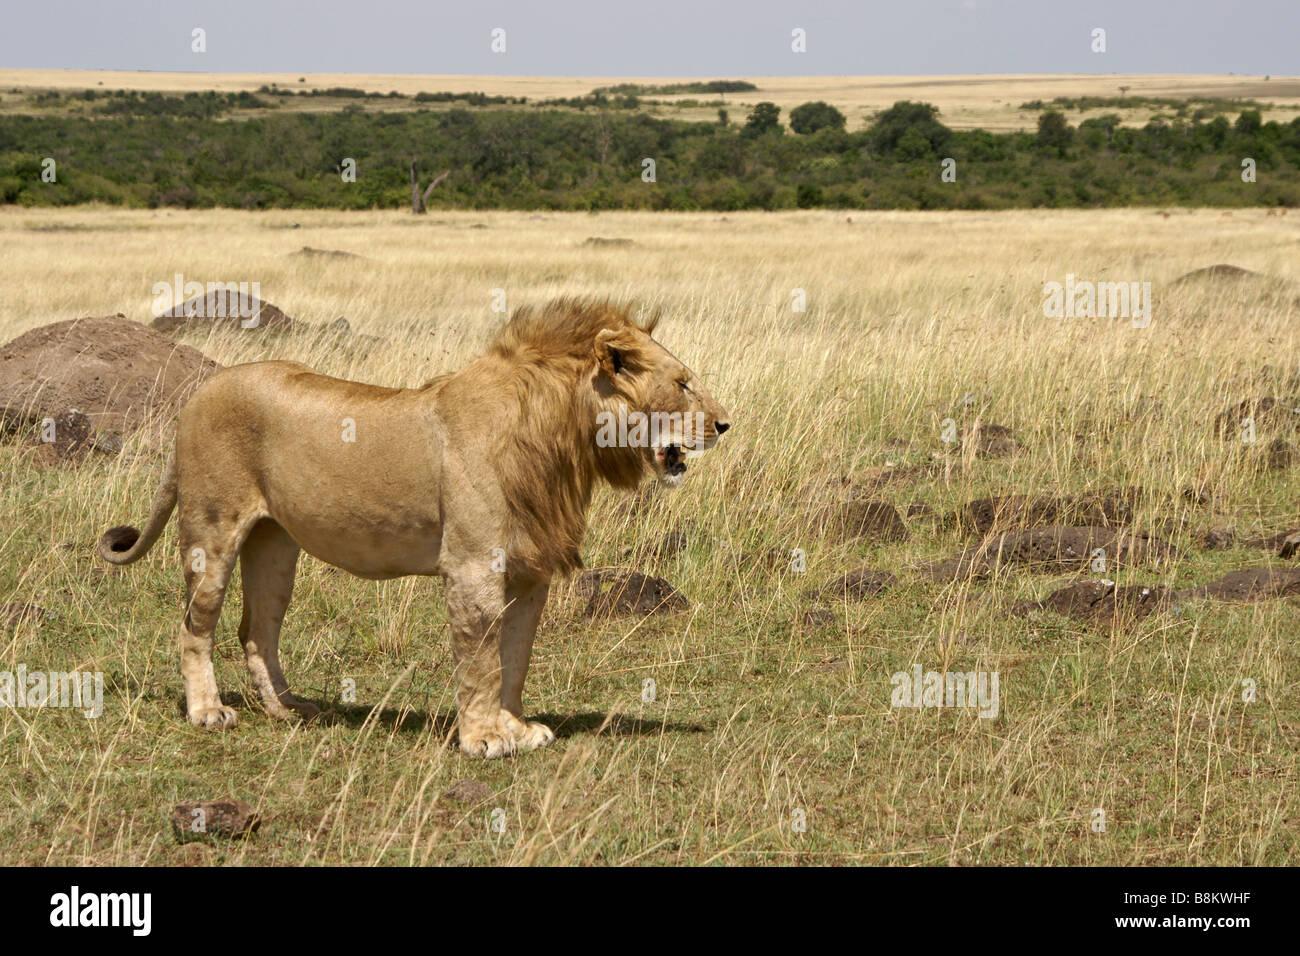 Lion mâle sur la savane, Masai Mara, Kenya Photo Stock